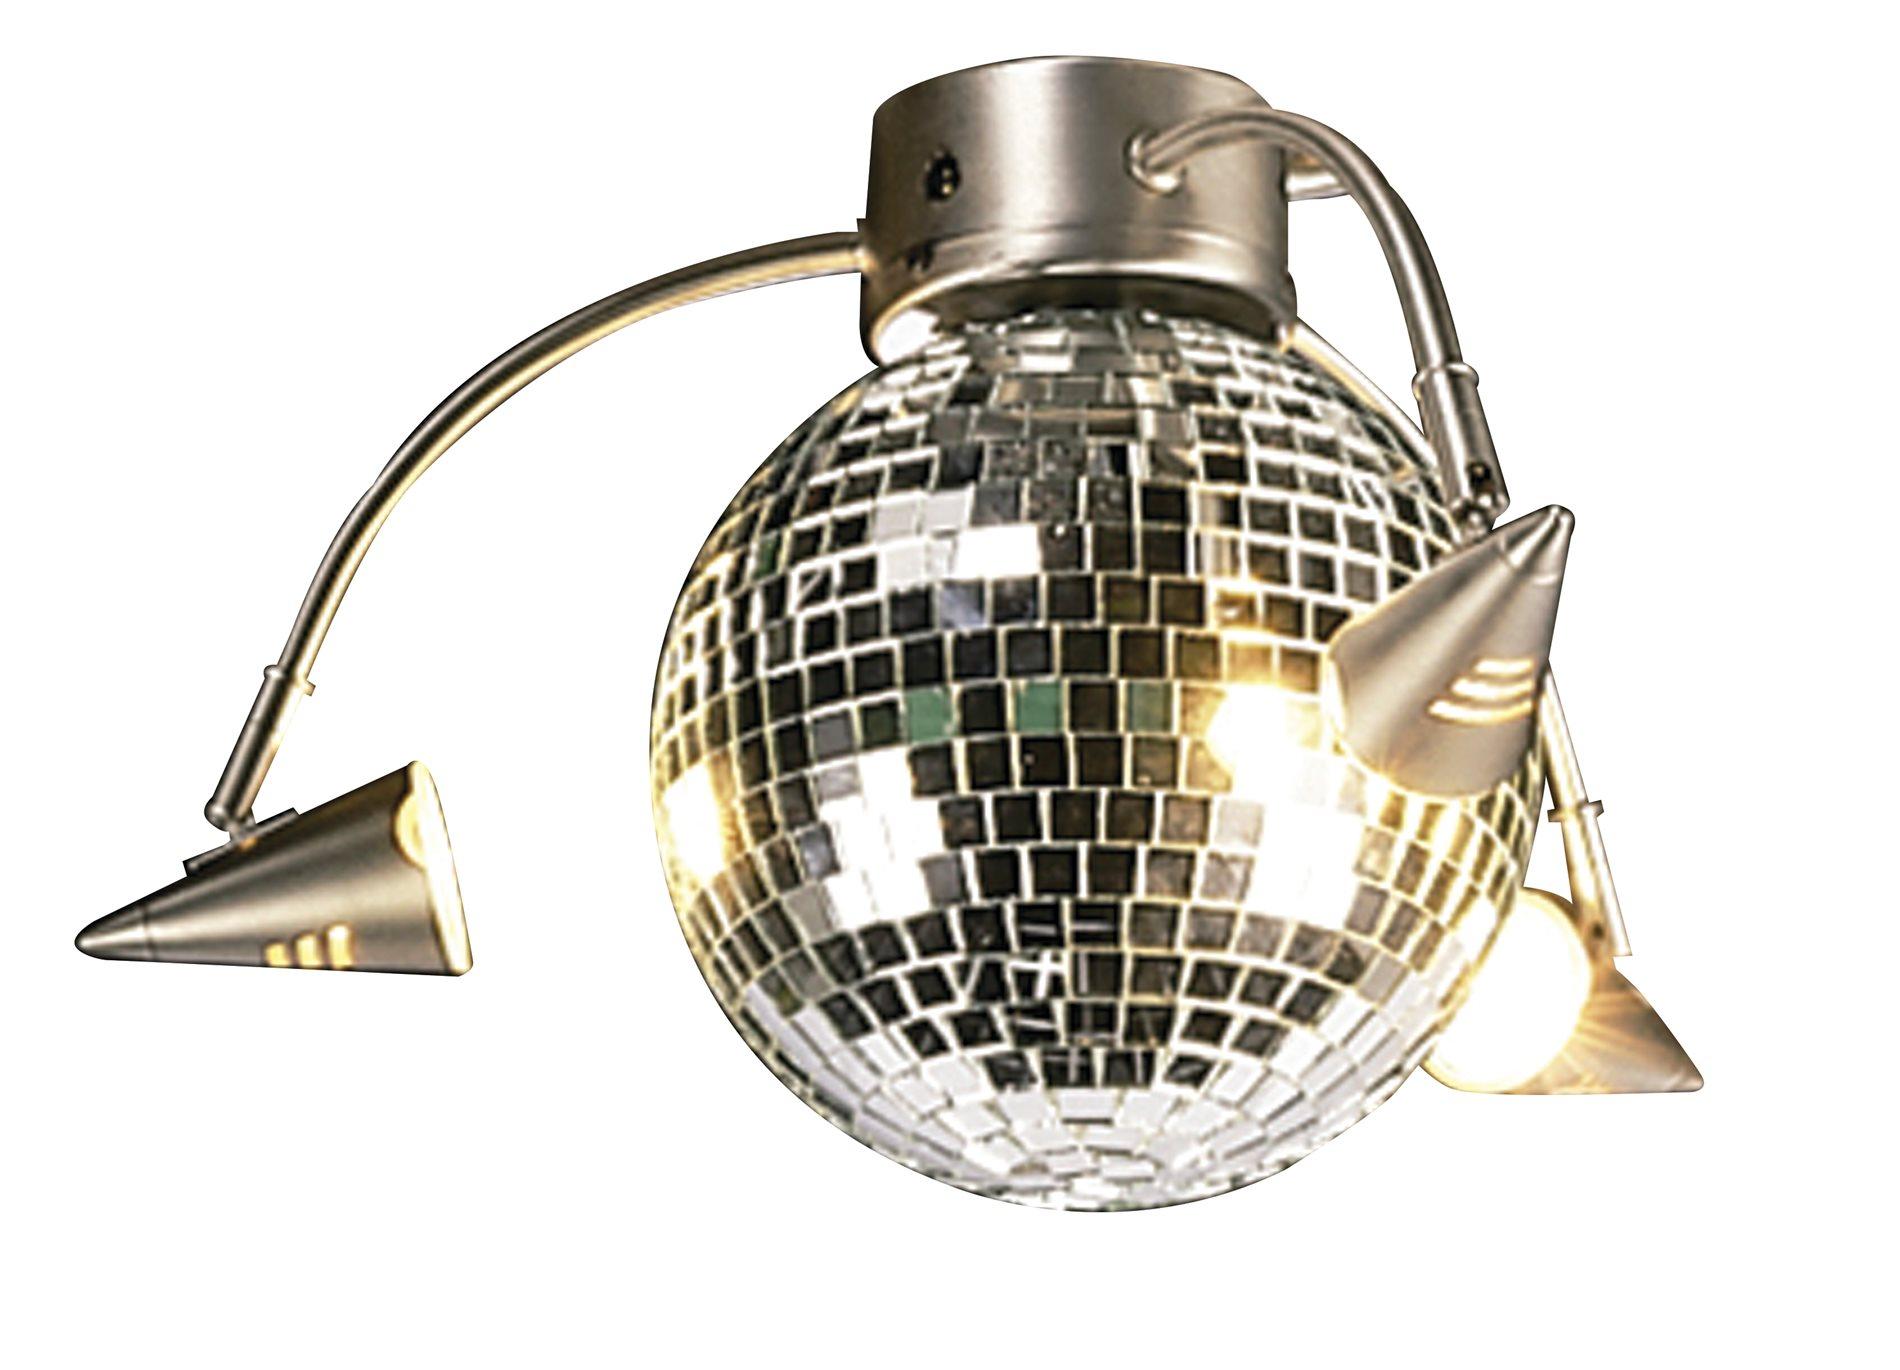 Craftmade lk55l bn 3 spotlight disco ball light kit cm lk55l bn zoom aloadofball Images